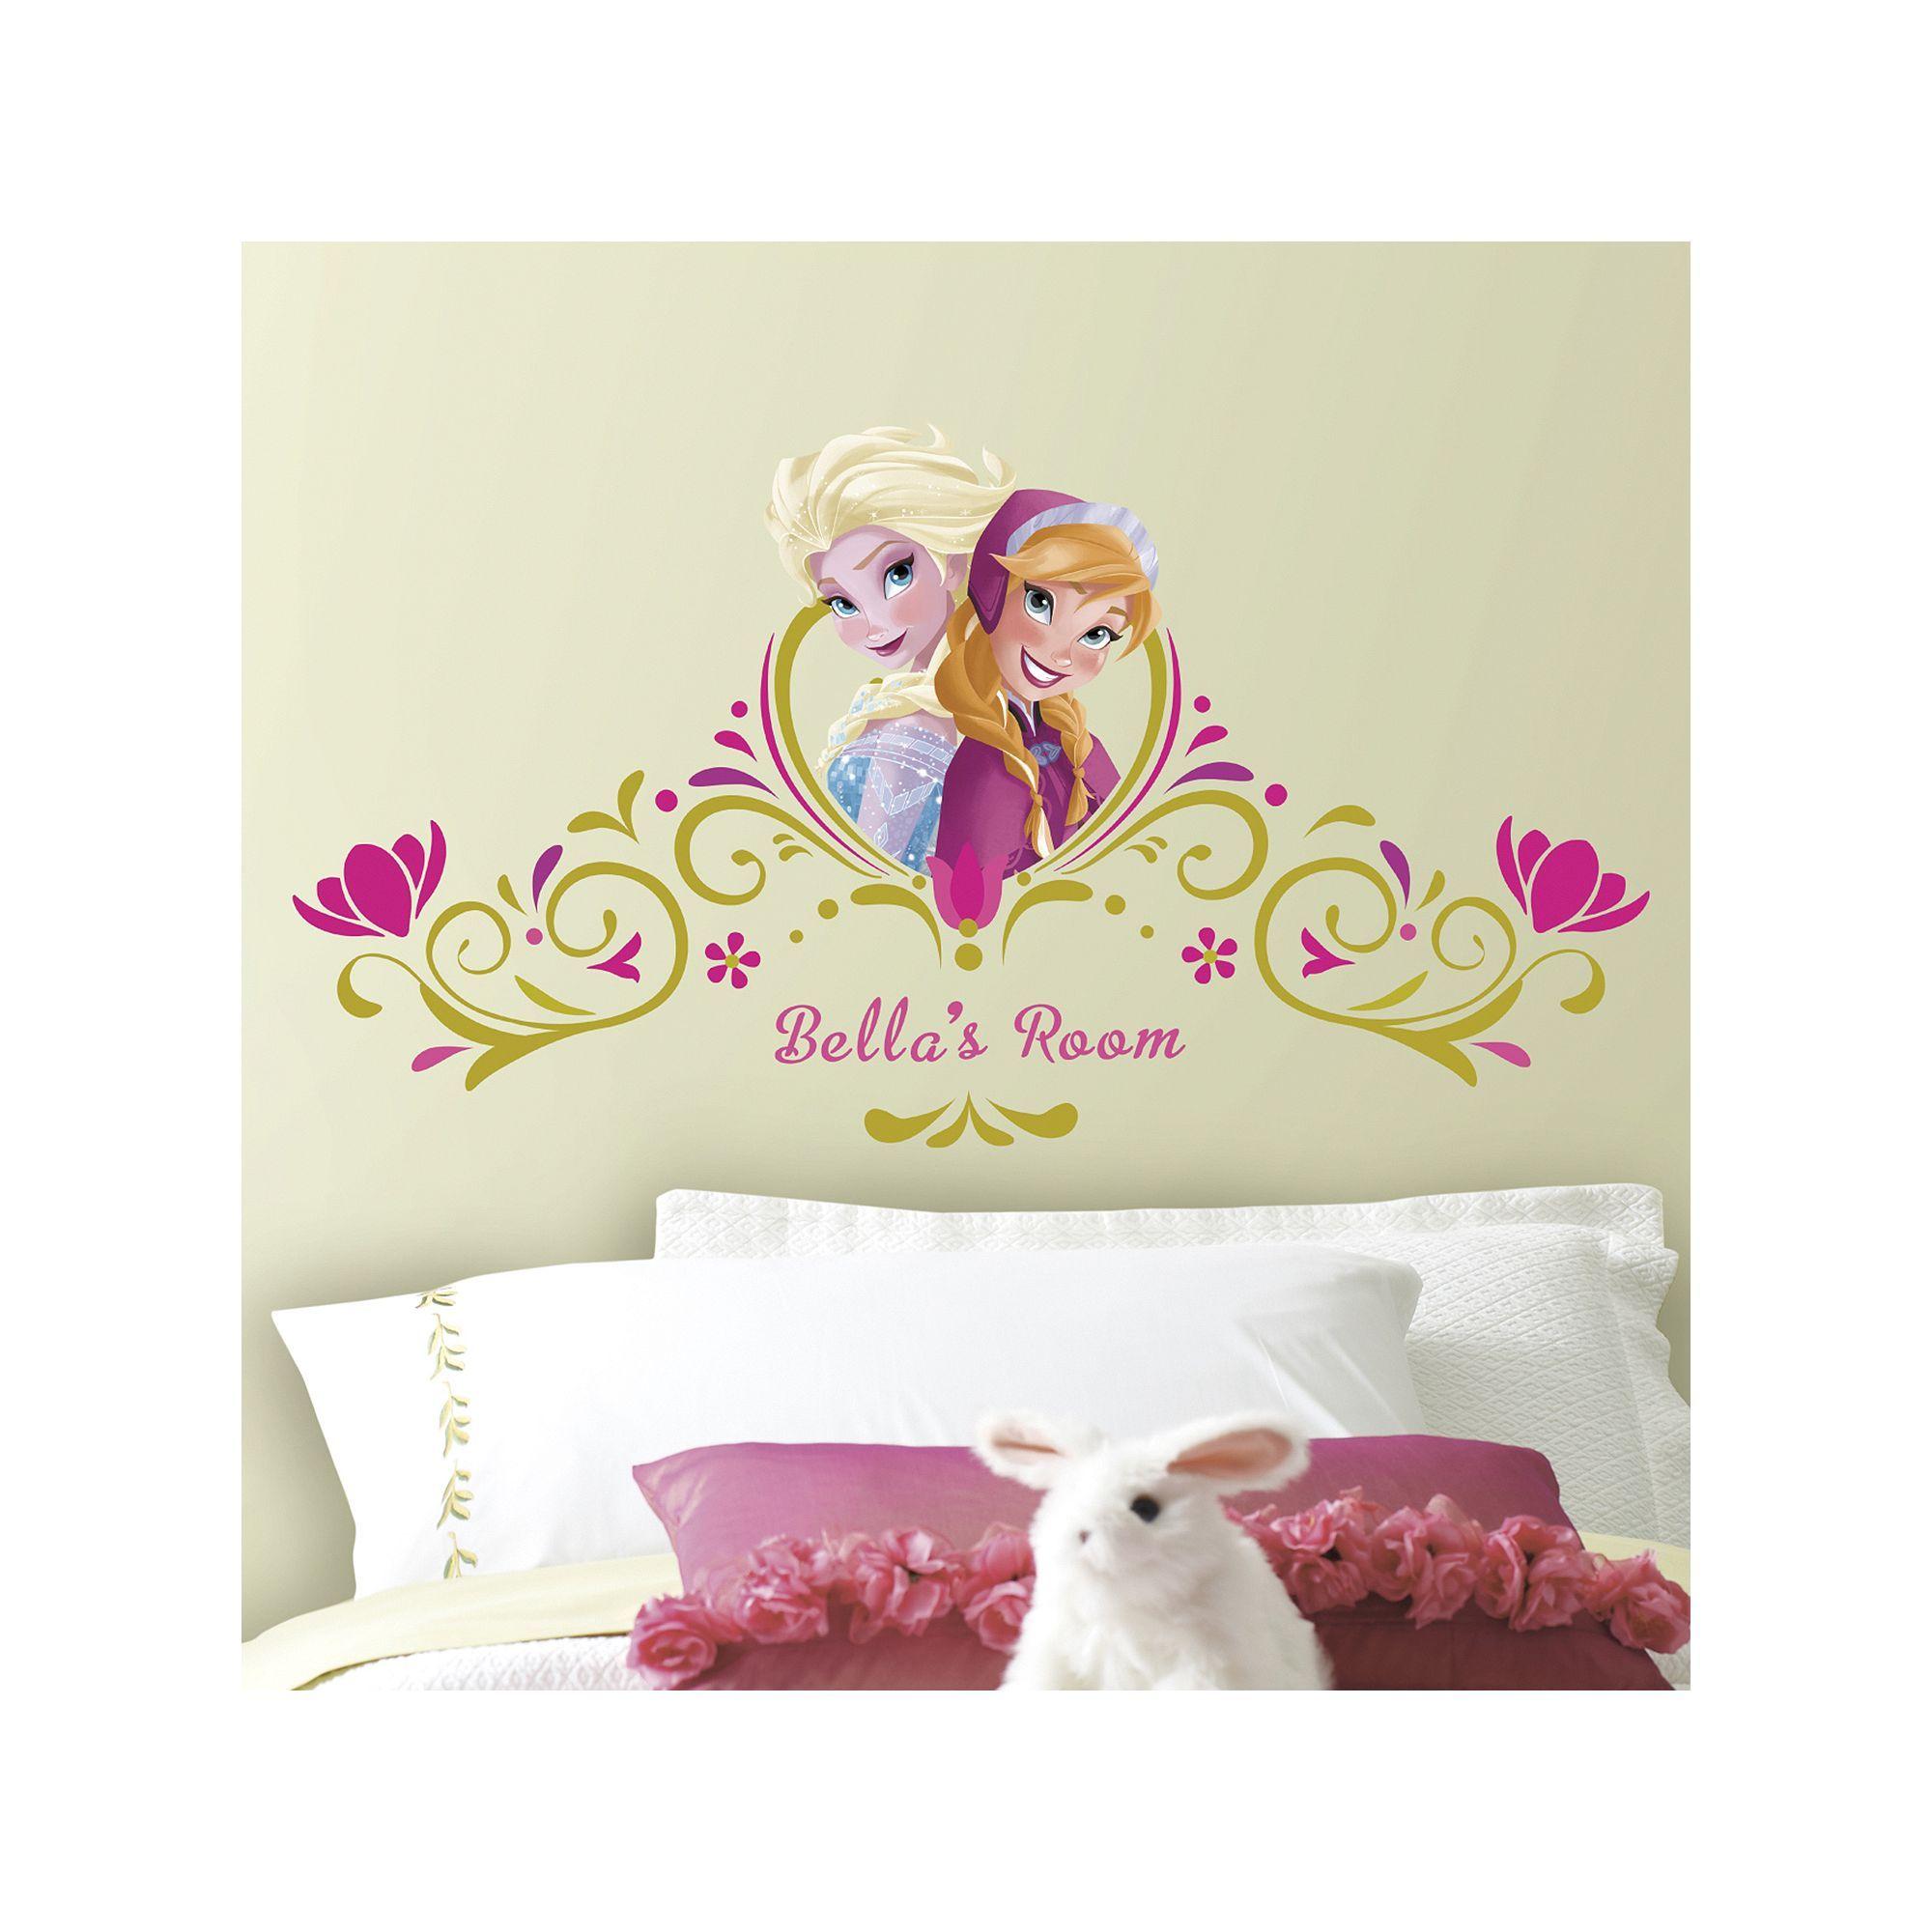 Frozen Theme Alphabet Wall Decal Stickers Peel /& Stick Kids Girls Bedroom Decors